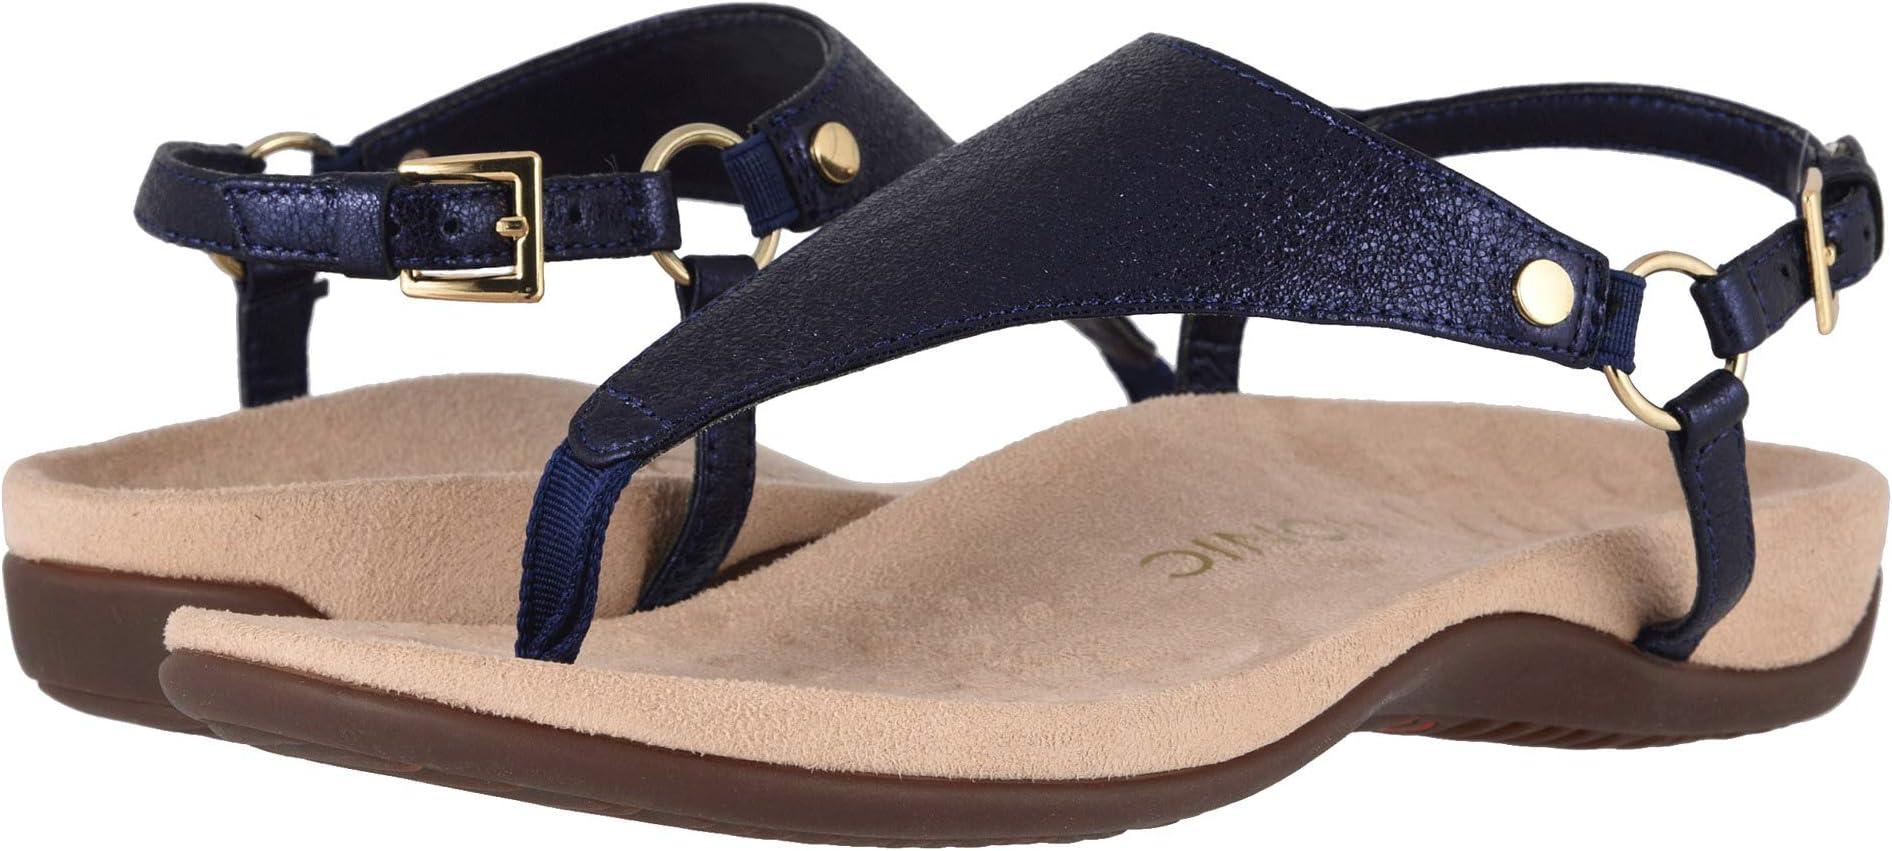 TC-2-Sandals-2019-4-01